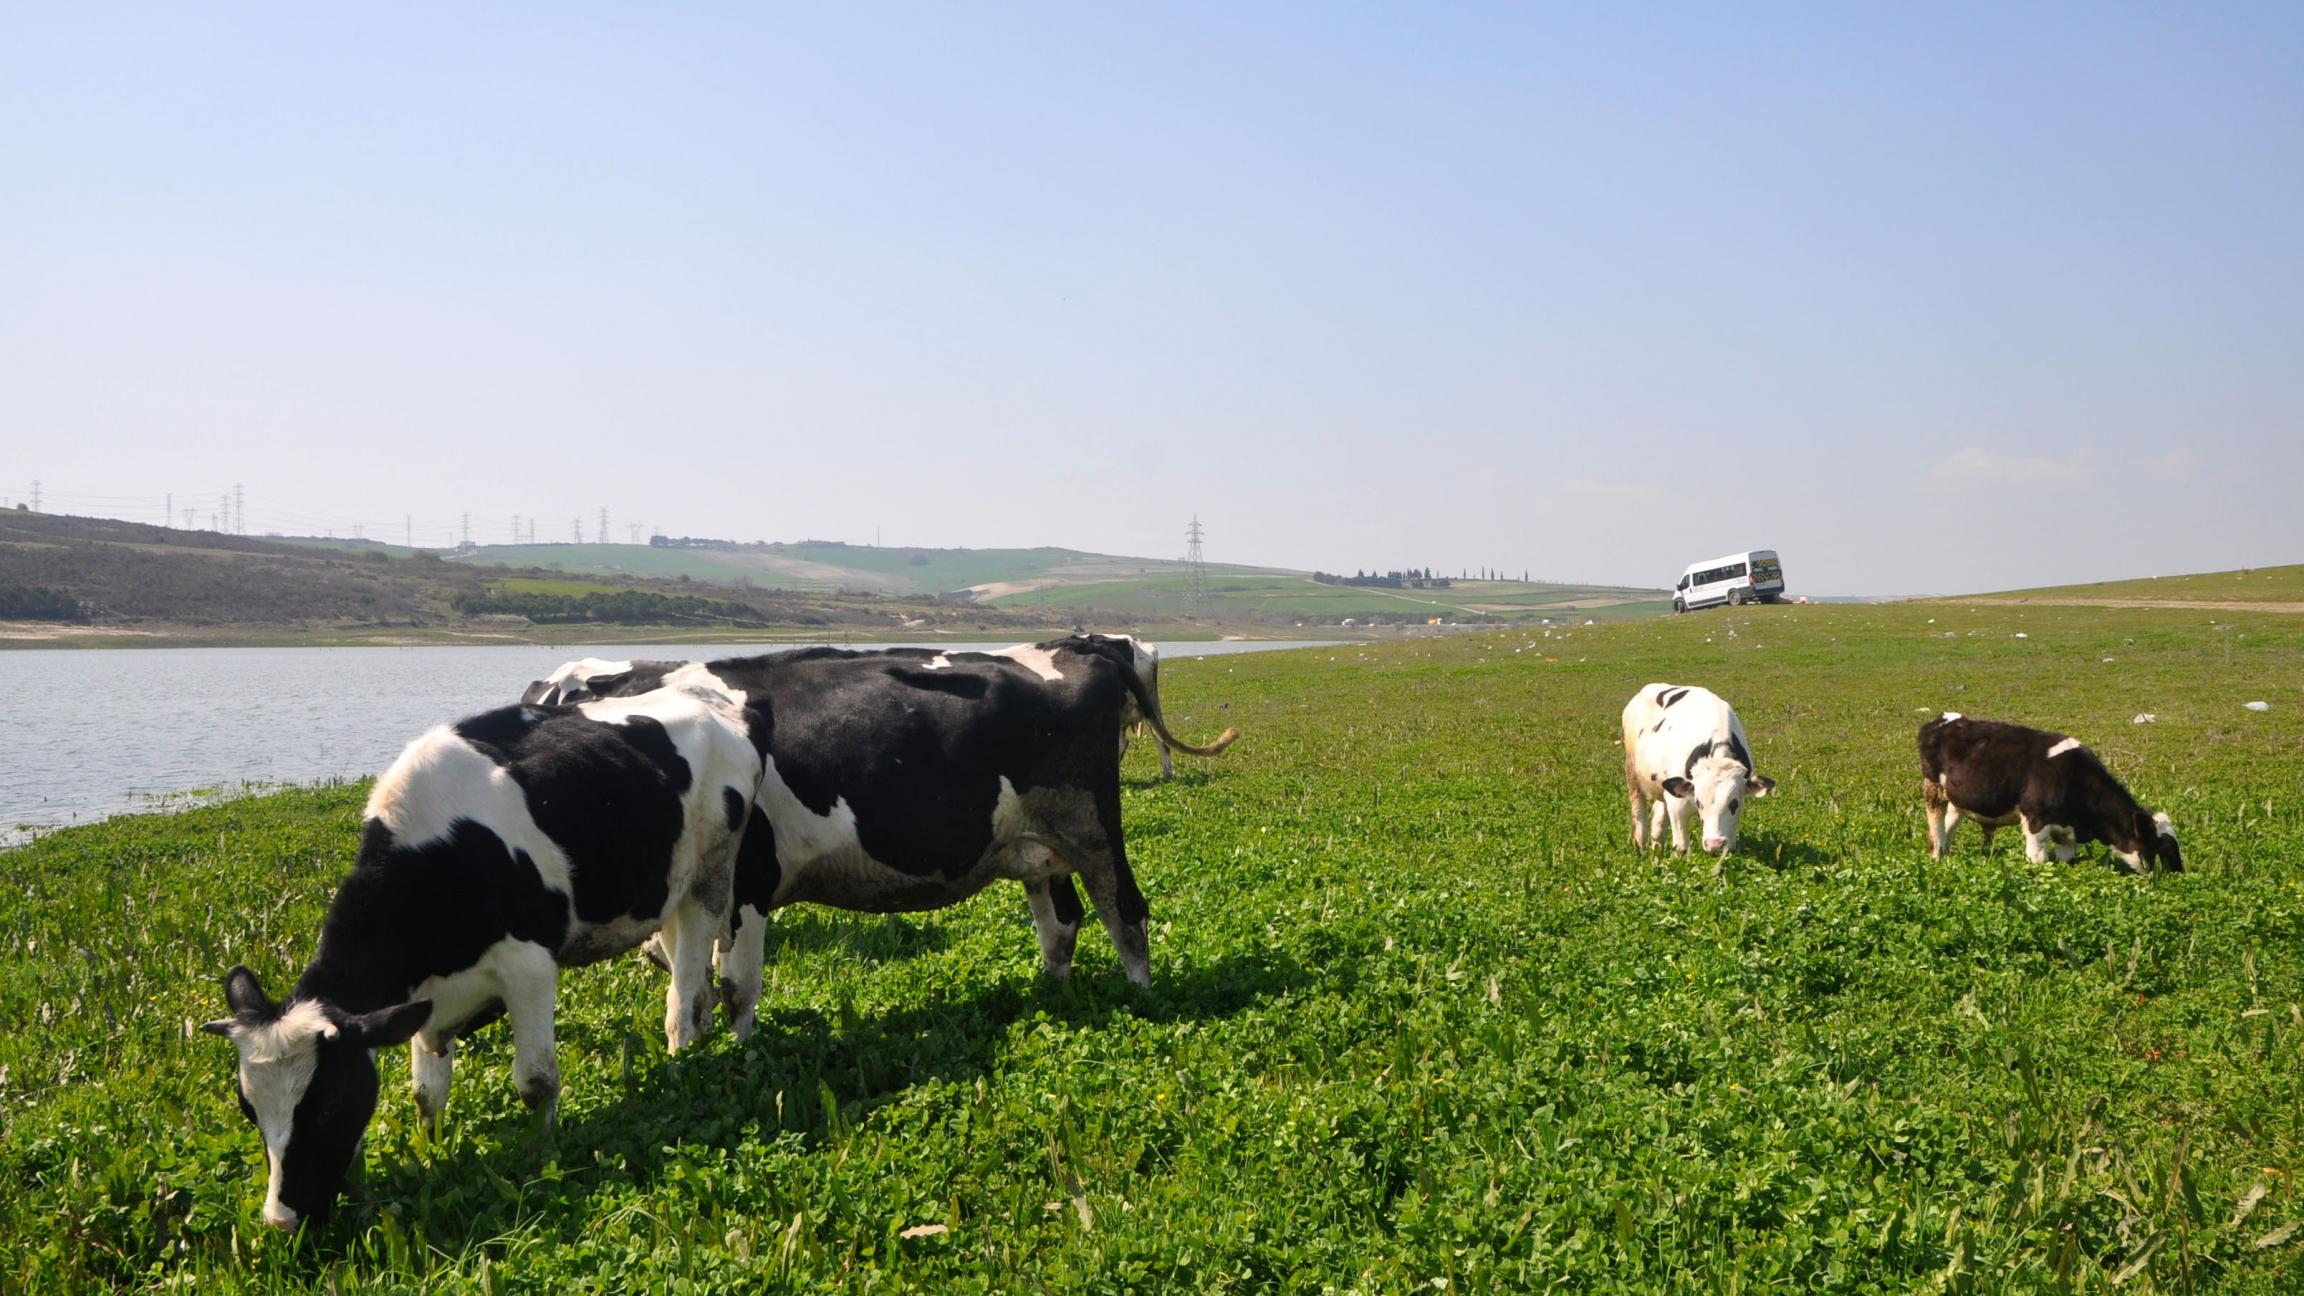 A few cows graze on green grass along a river in daylight hours.